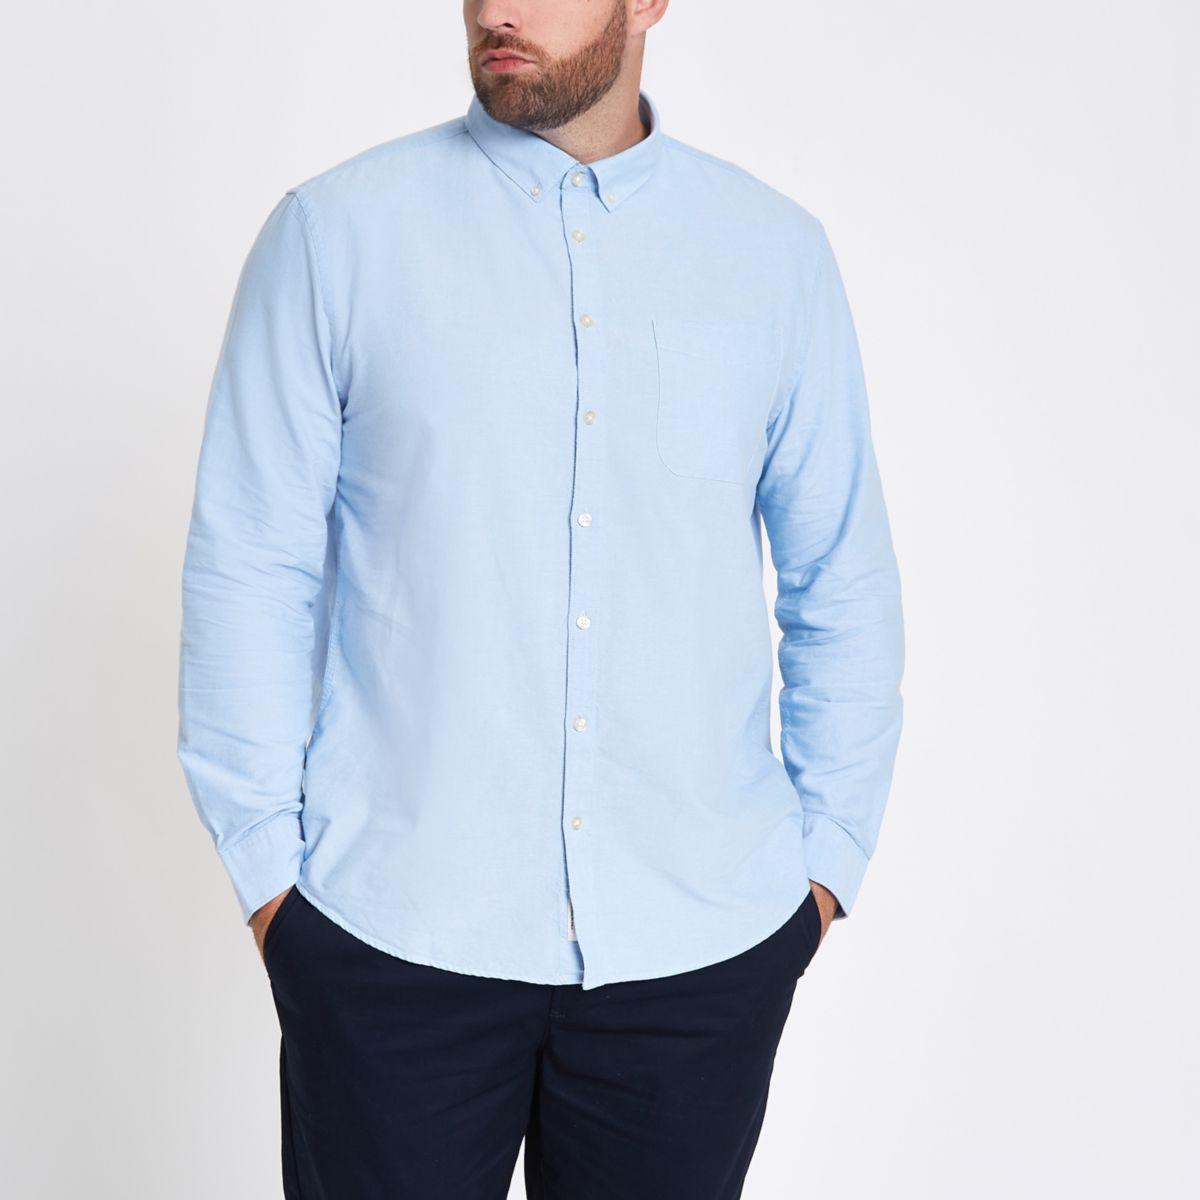 Big and Tall light blue long sleeve shirt